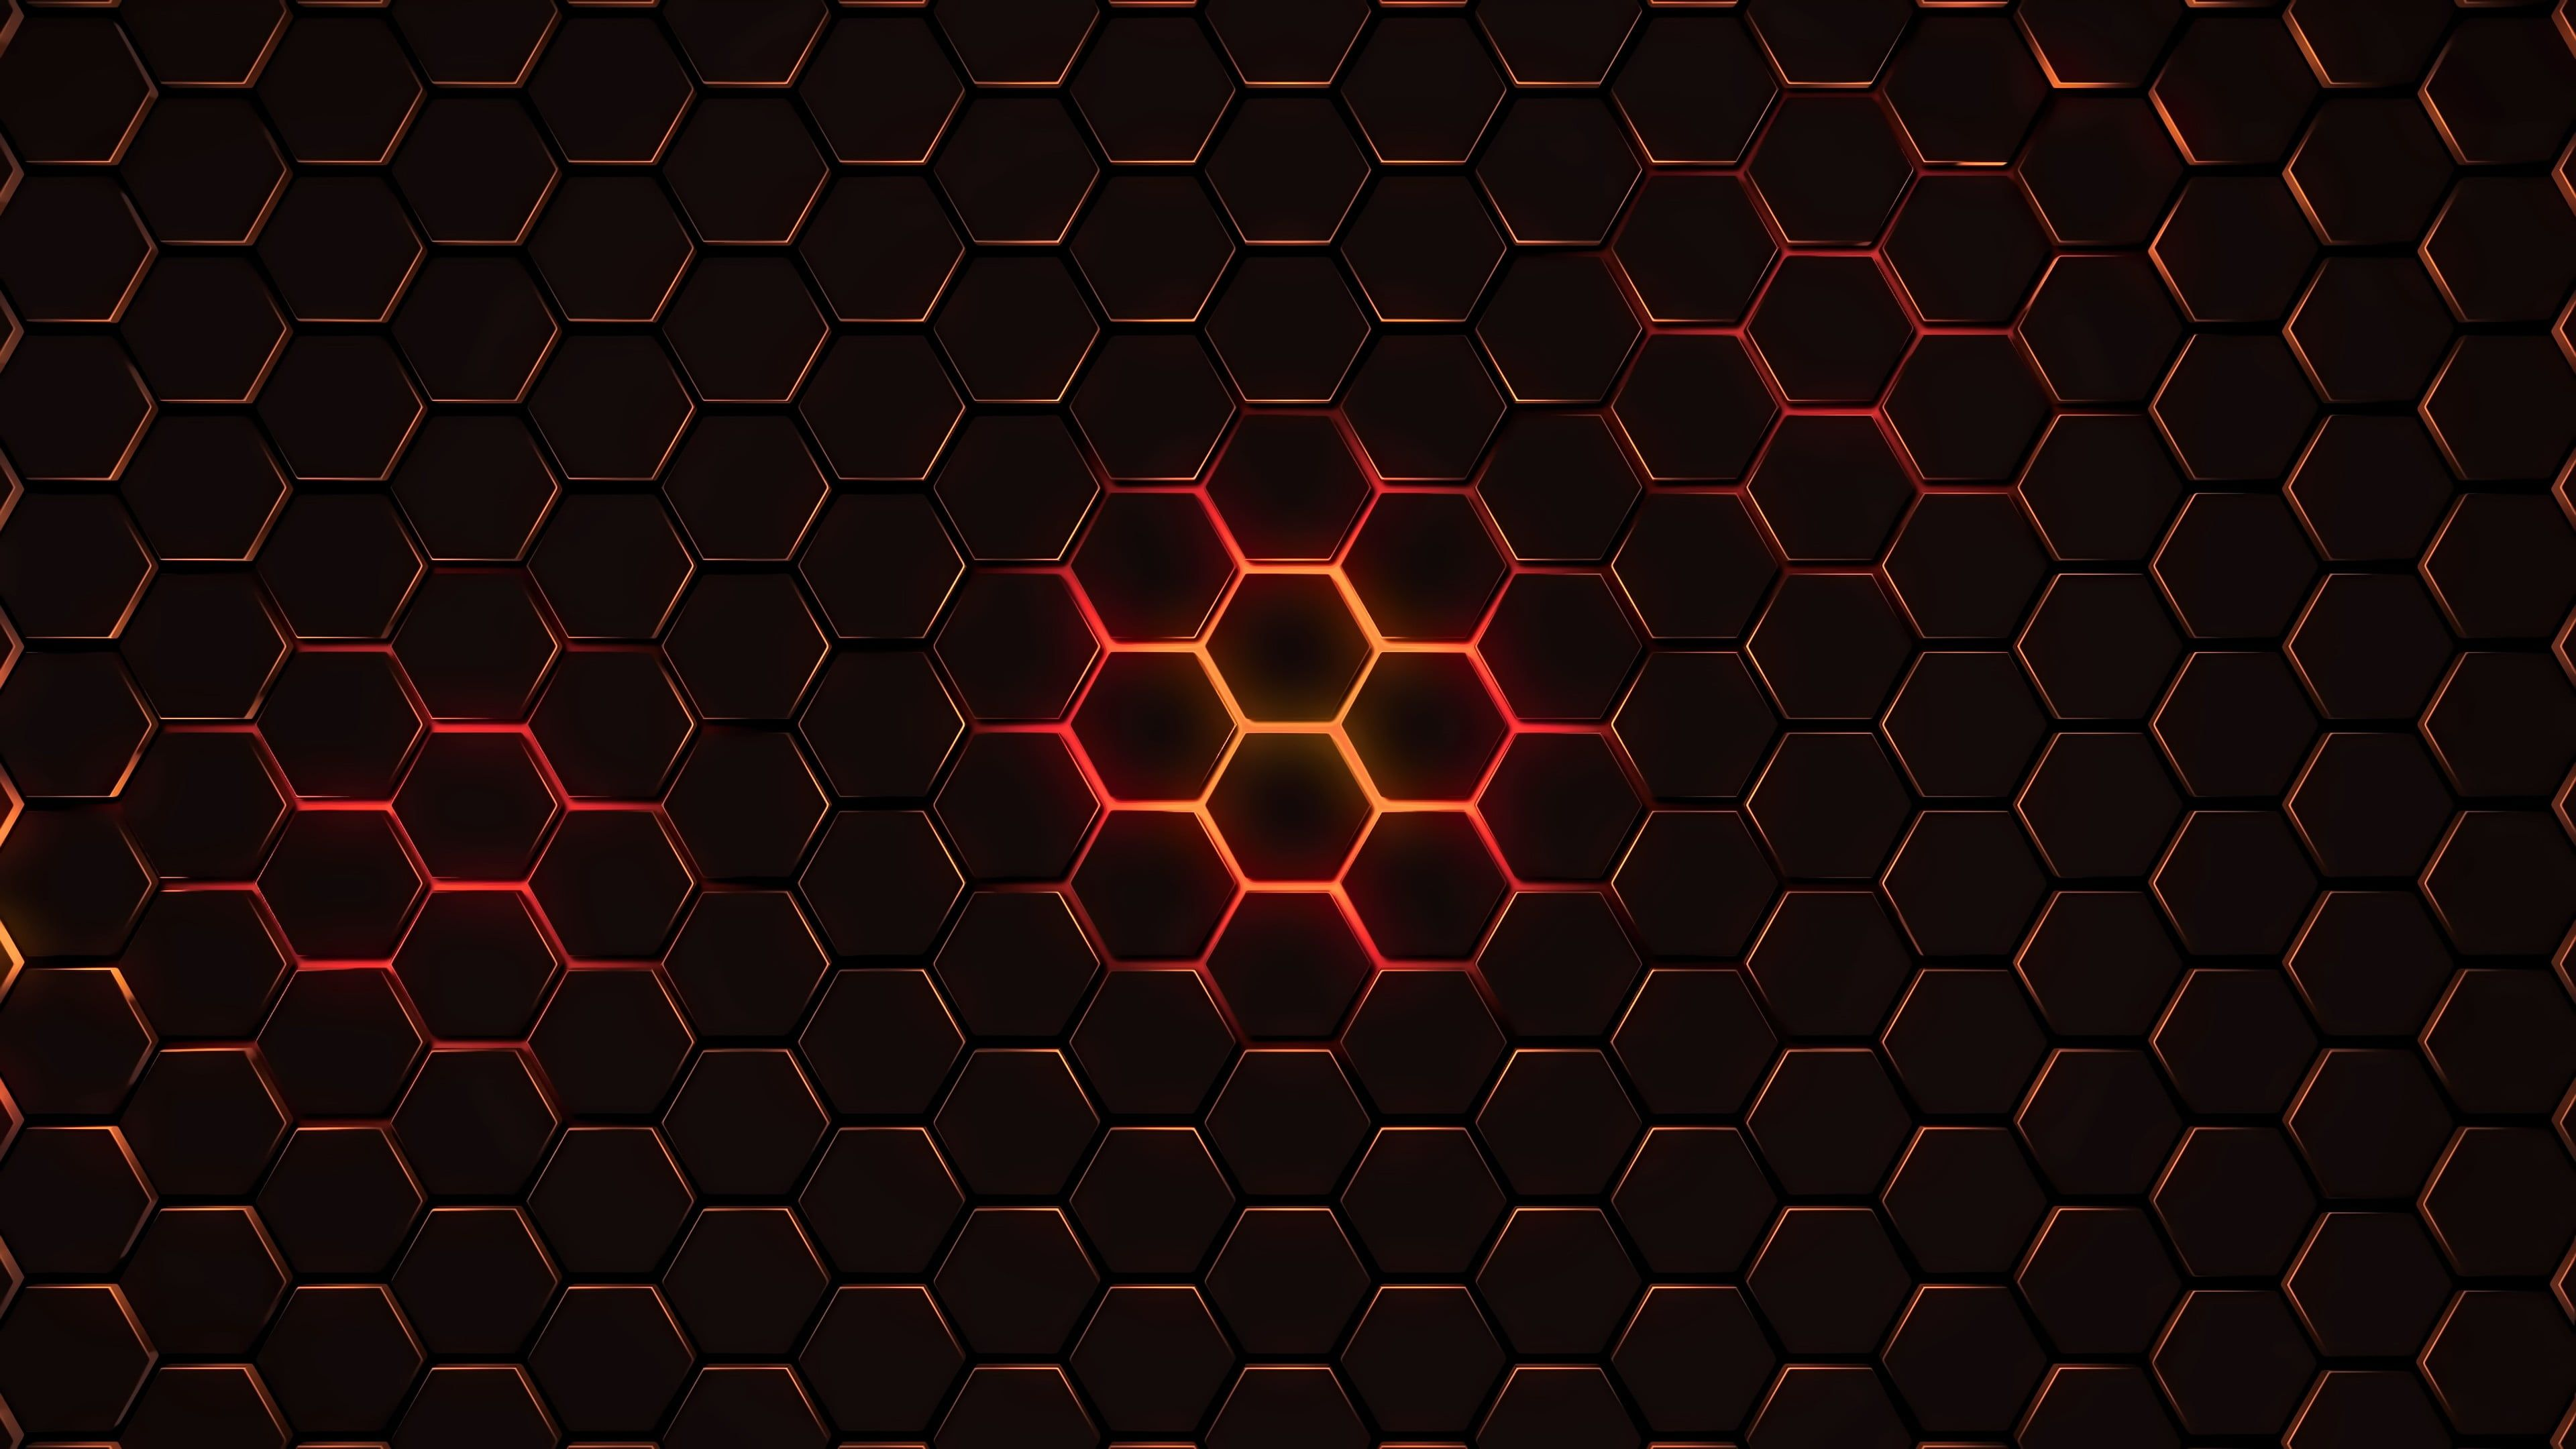 Grey And Black Illustration Abstract Geometry Hexagon 4k Wallpaper Hdwallpaper Desktop Hexagon Wallpaper Abstract Wallpaper Bokeh Wallpaper Geometric desktop wallpaper 4k